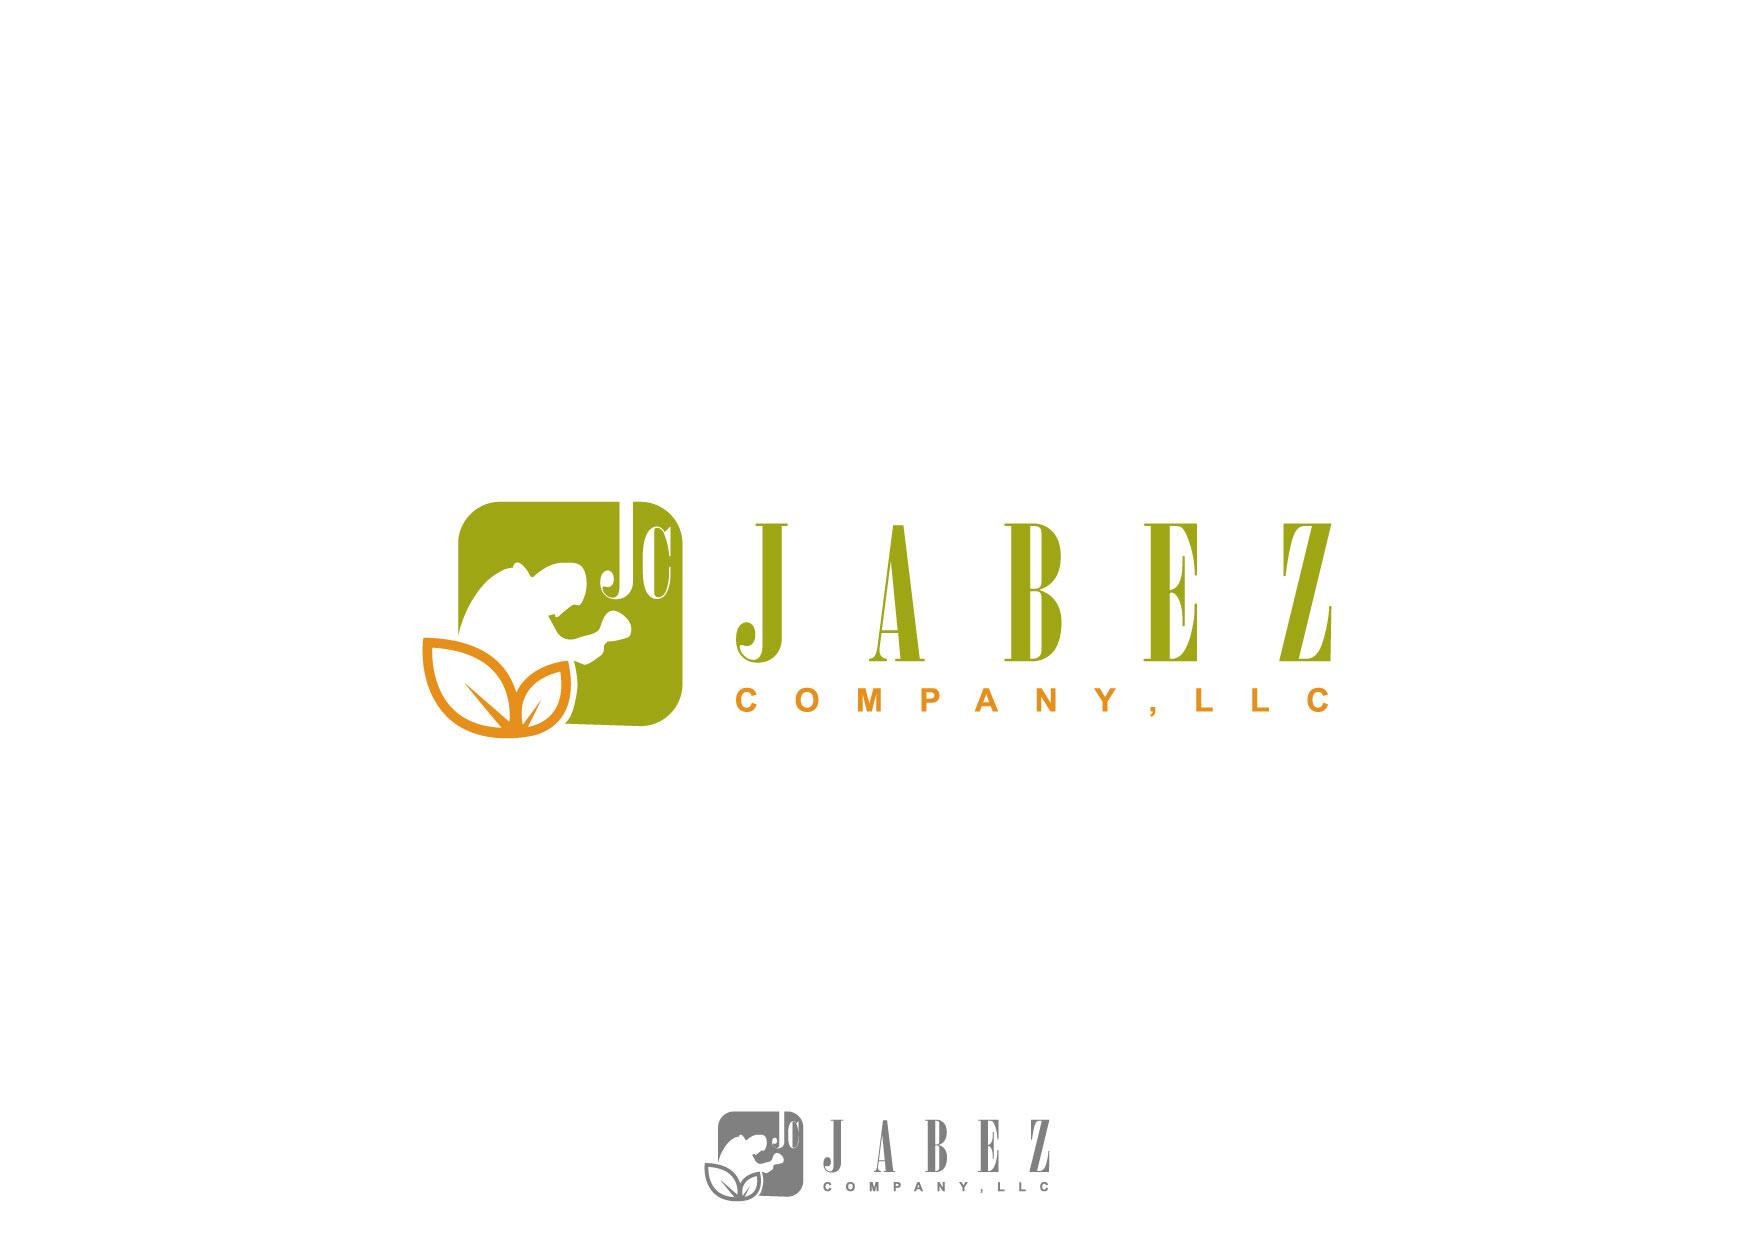 Logo Design by Nurgalih Destianto - Entry No. 93 in the Logo Design Contest New Logo Design for Jabez Compnay, LLC.